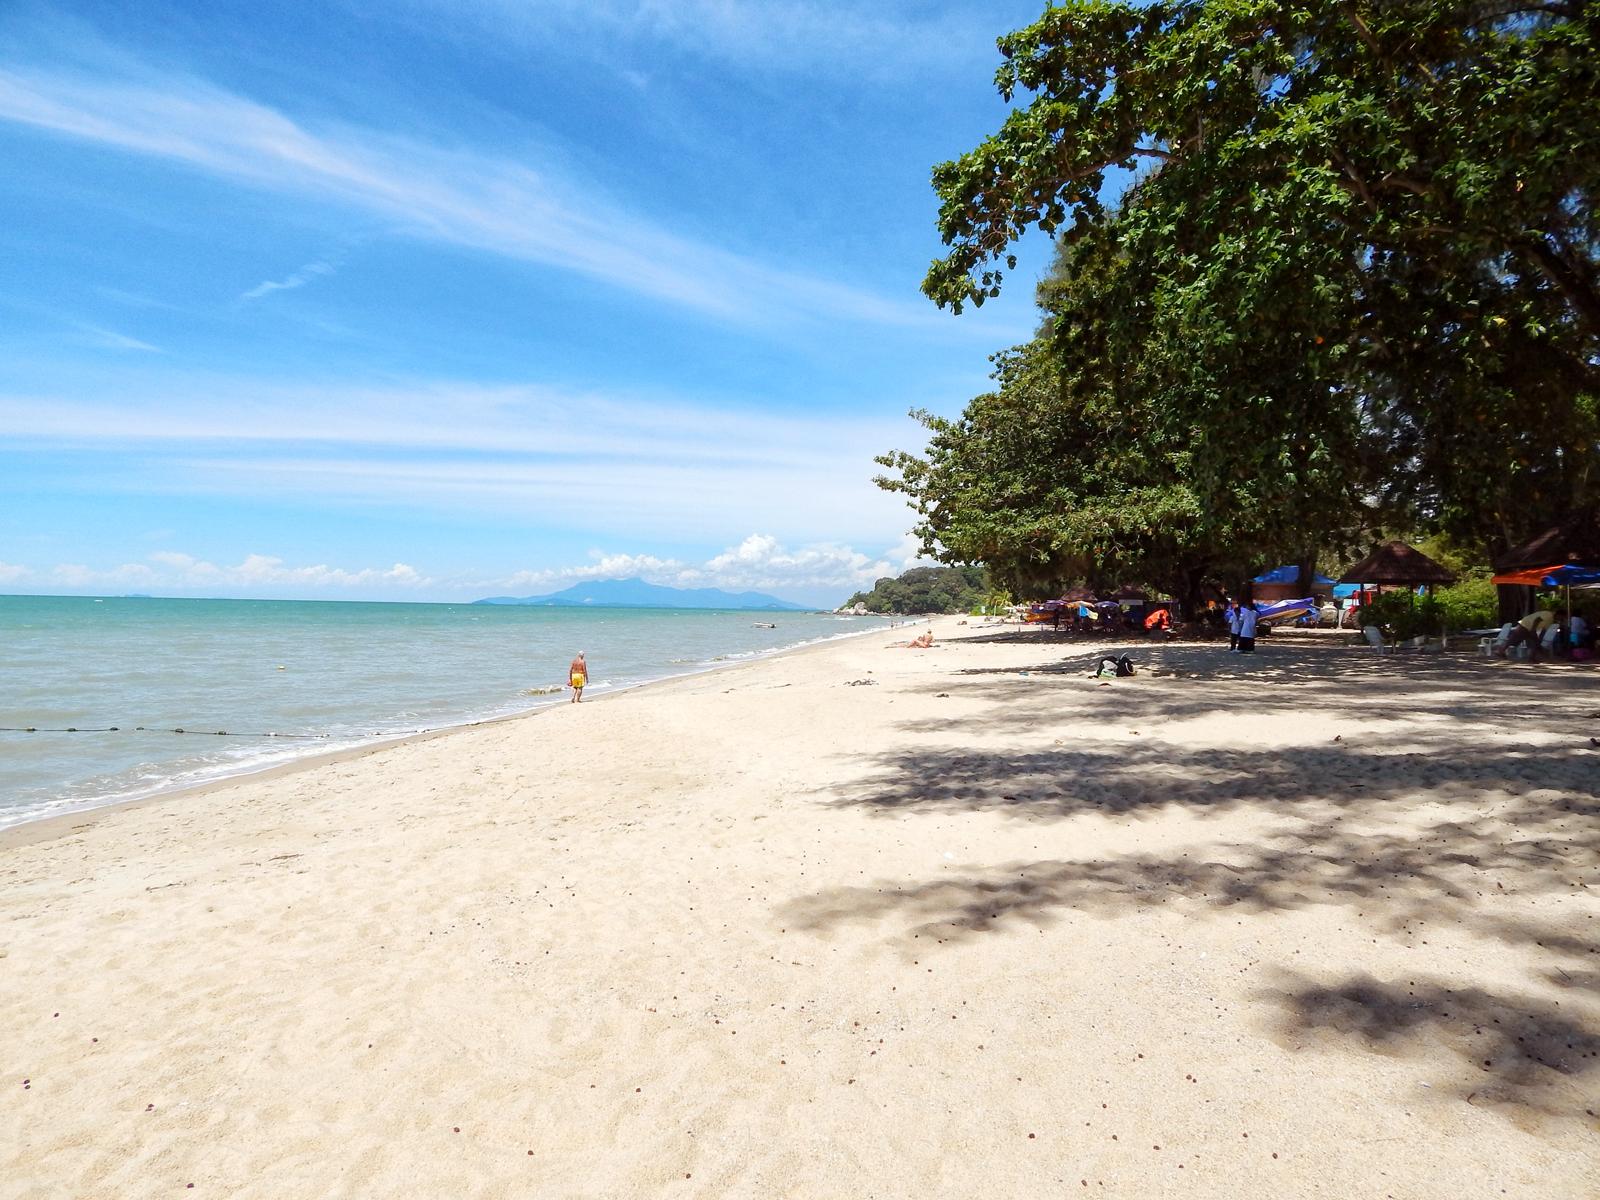 Отдых на острове Пенанг в Малайзии